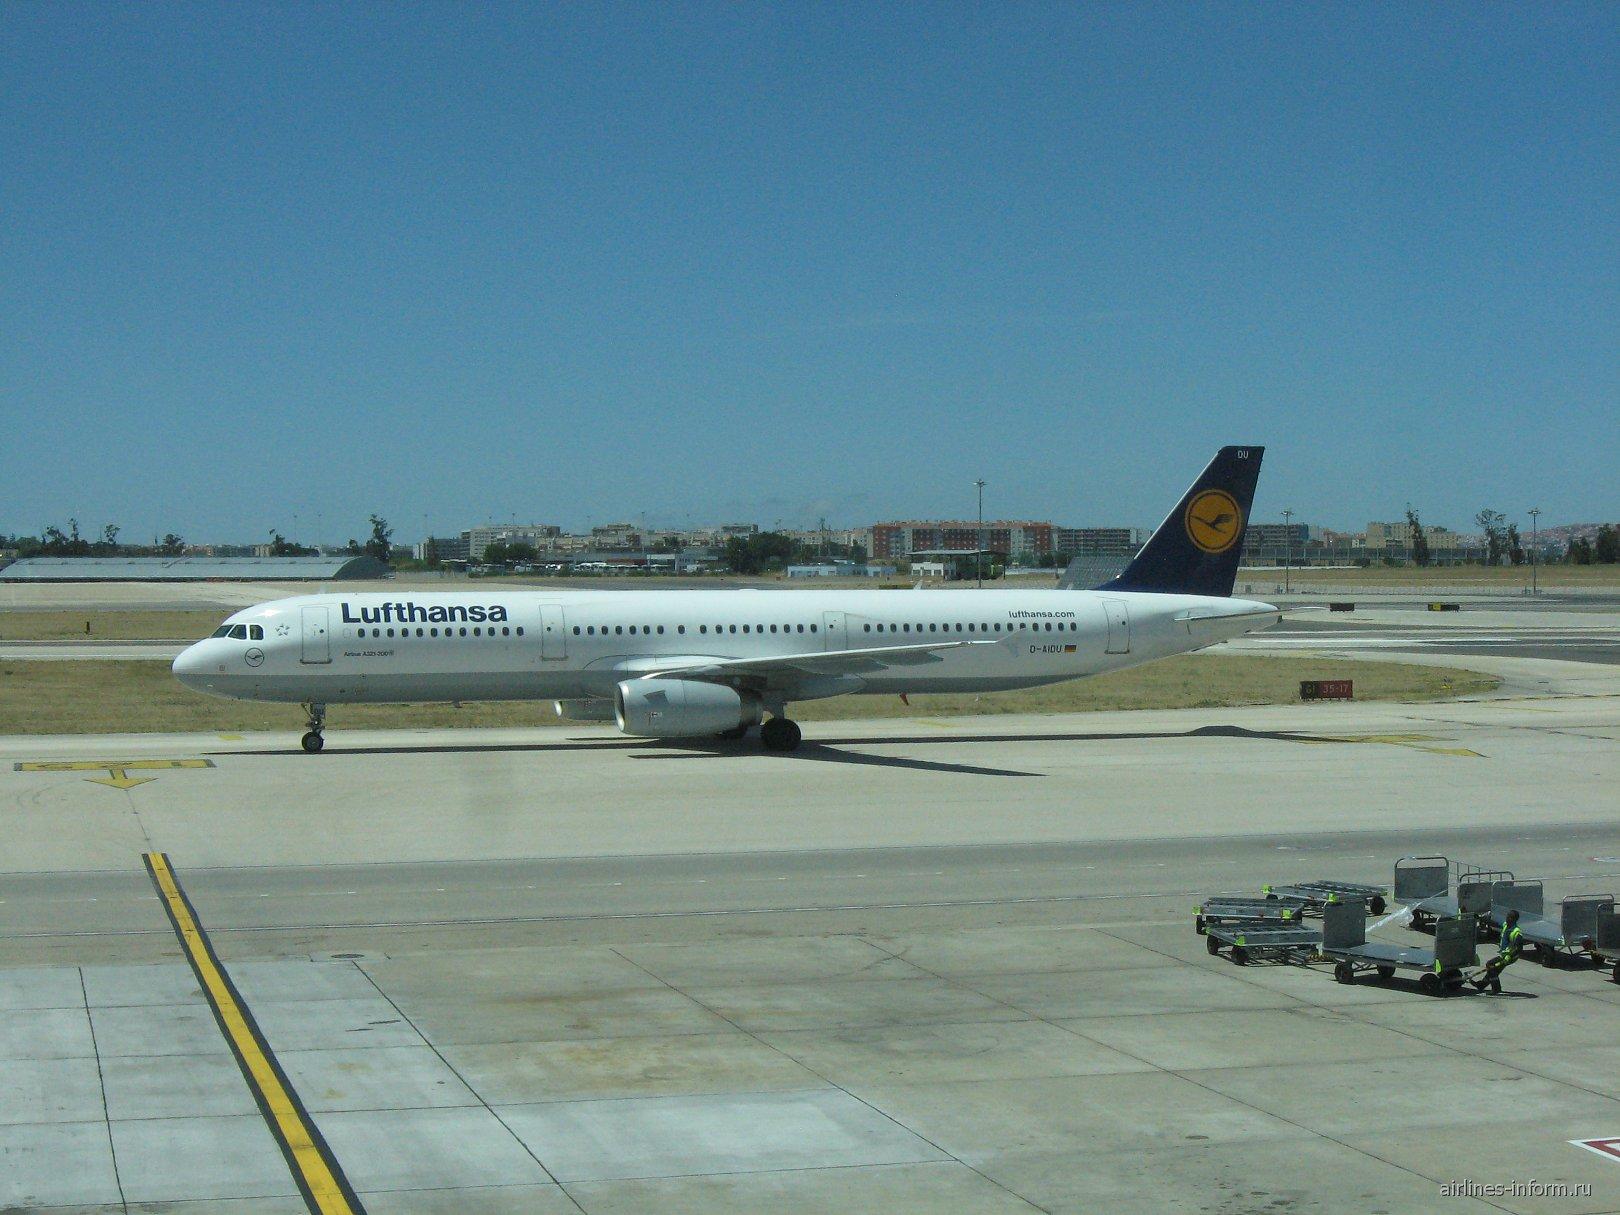 Airbus A321 авиакомпании Lufthansa в аэропорту Лиссабон Портела